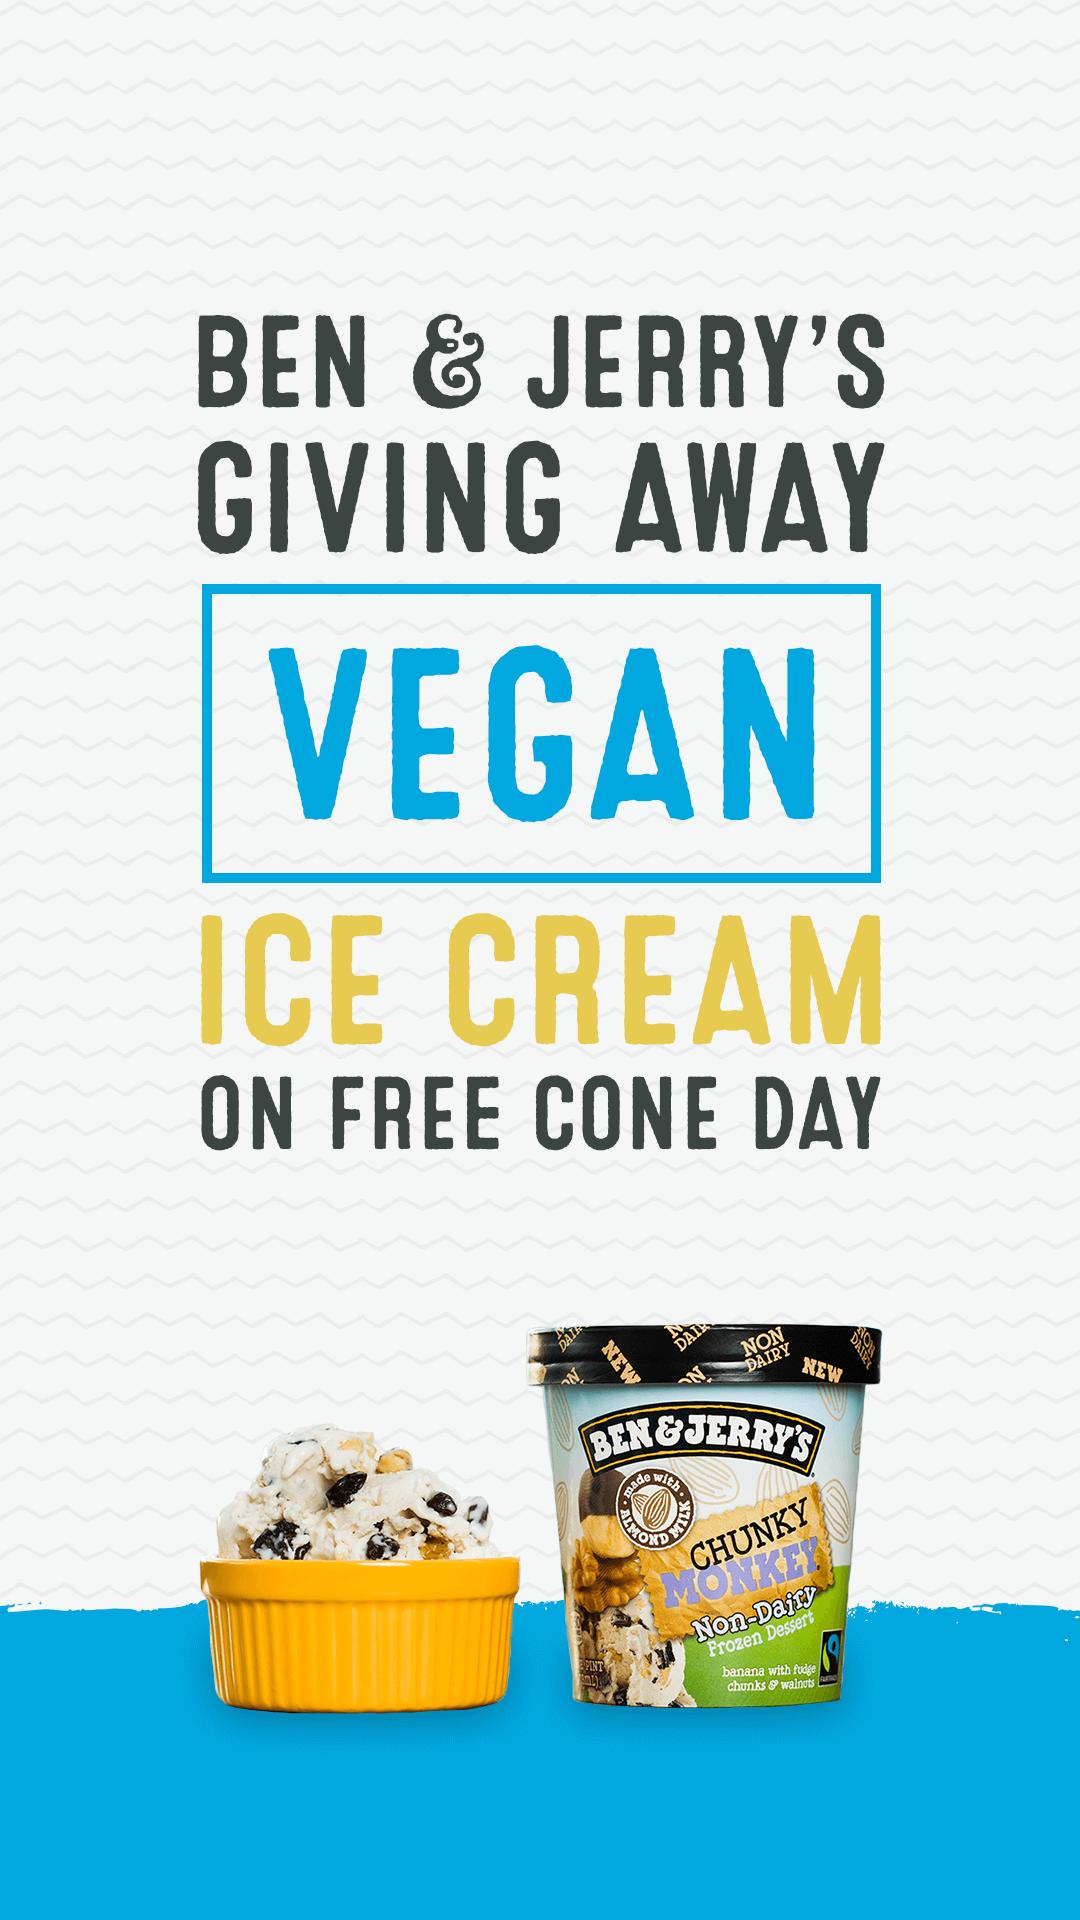 Ben & Jerry's Giving Away Vegan Ice Cream on Free Cone Day